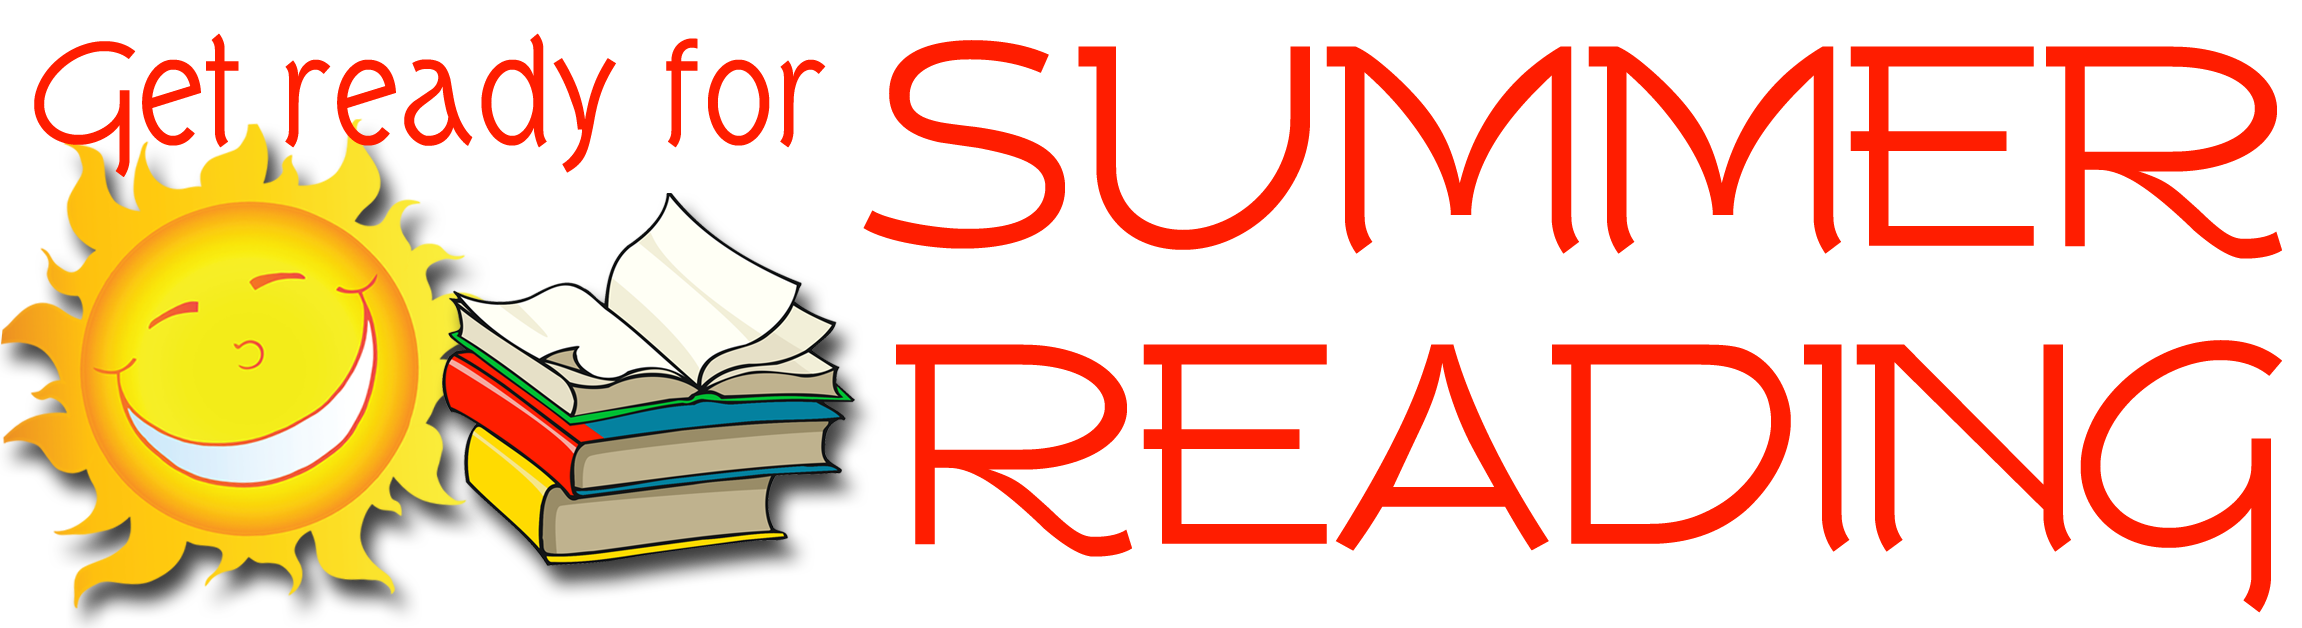 Clipart reading summer. Rush strong school grades